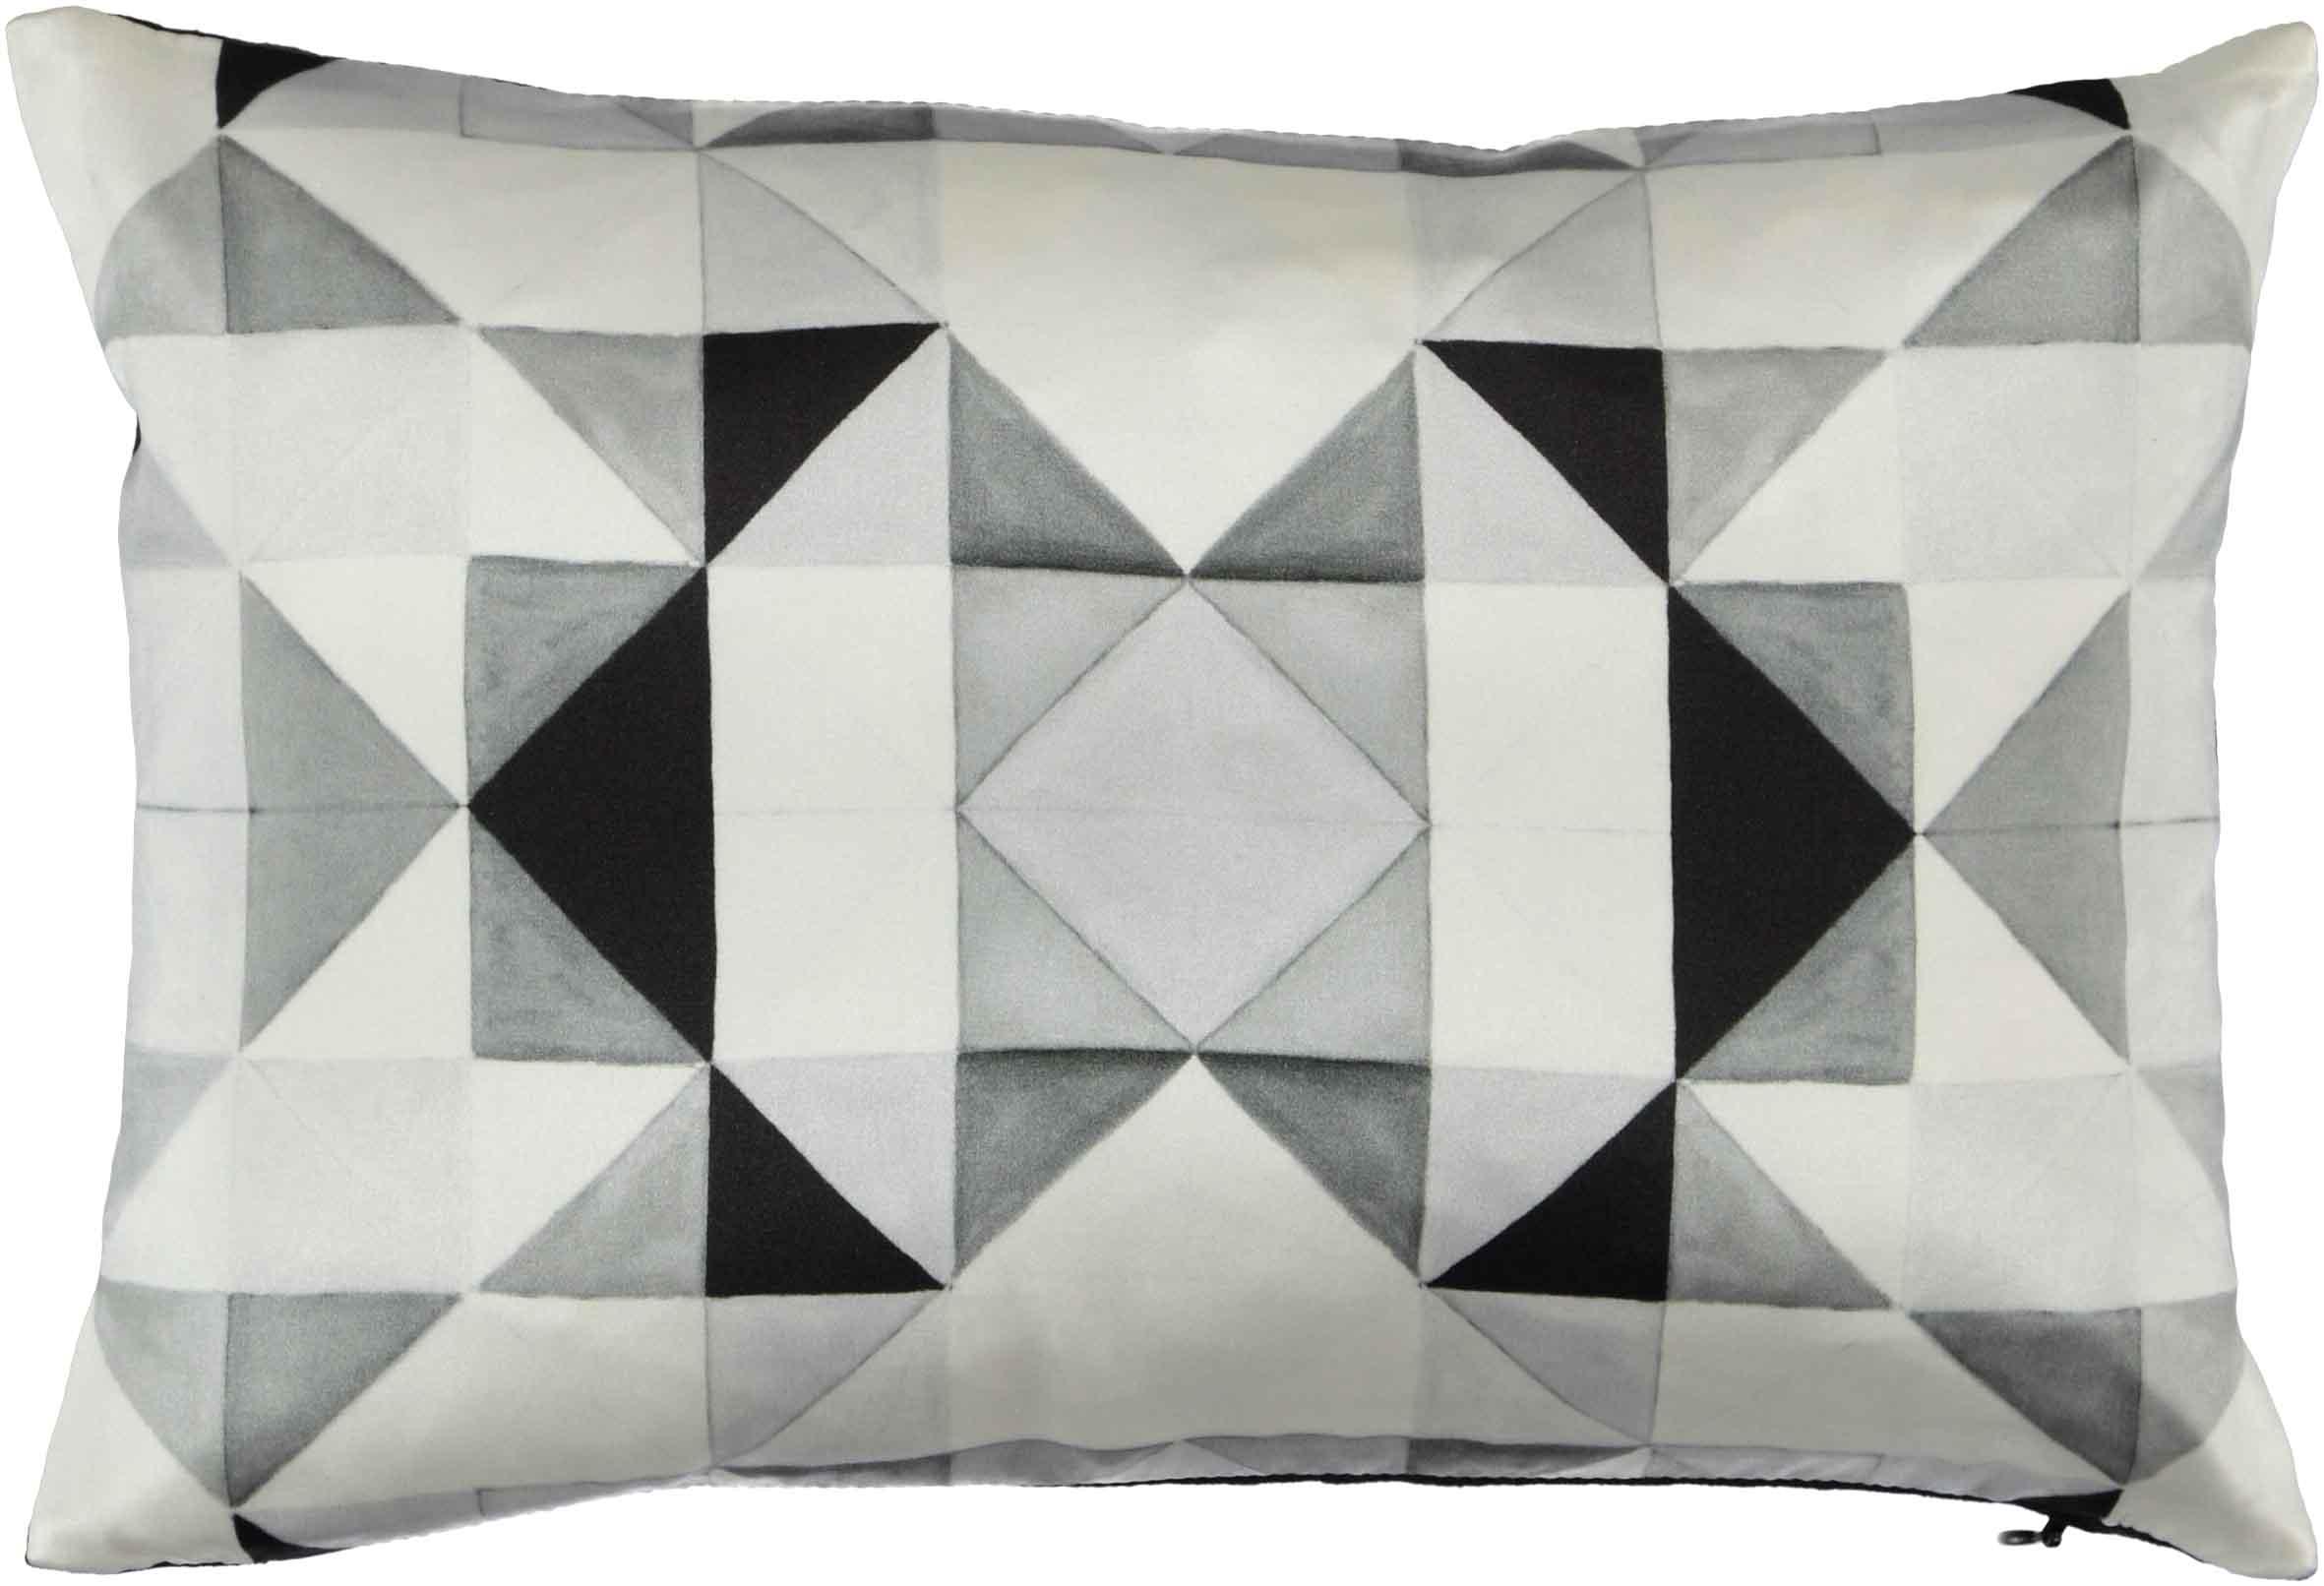 Bold Cubsim Black Pillow - 25 x 35